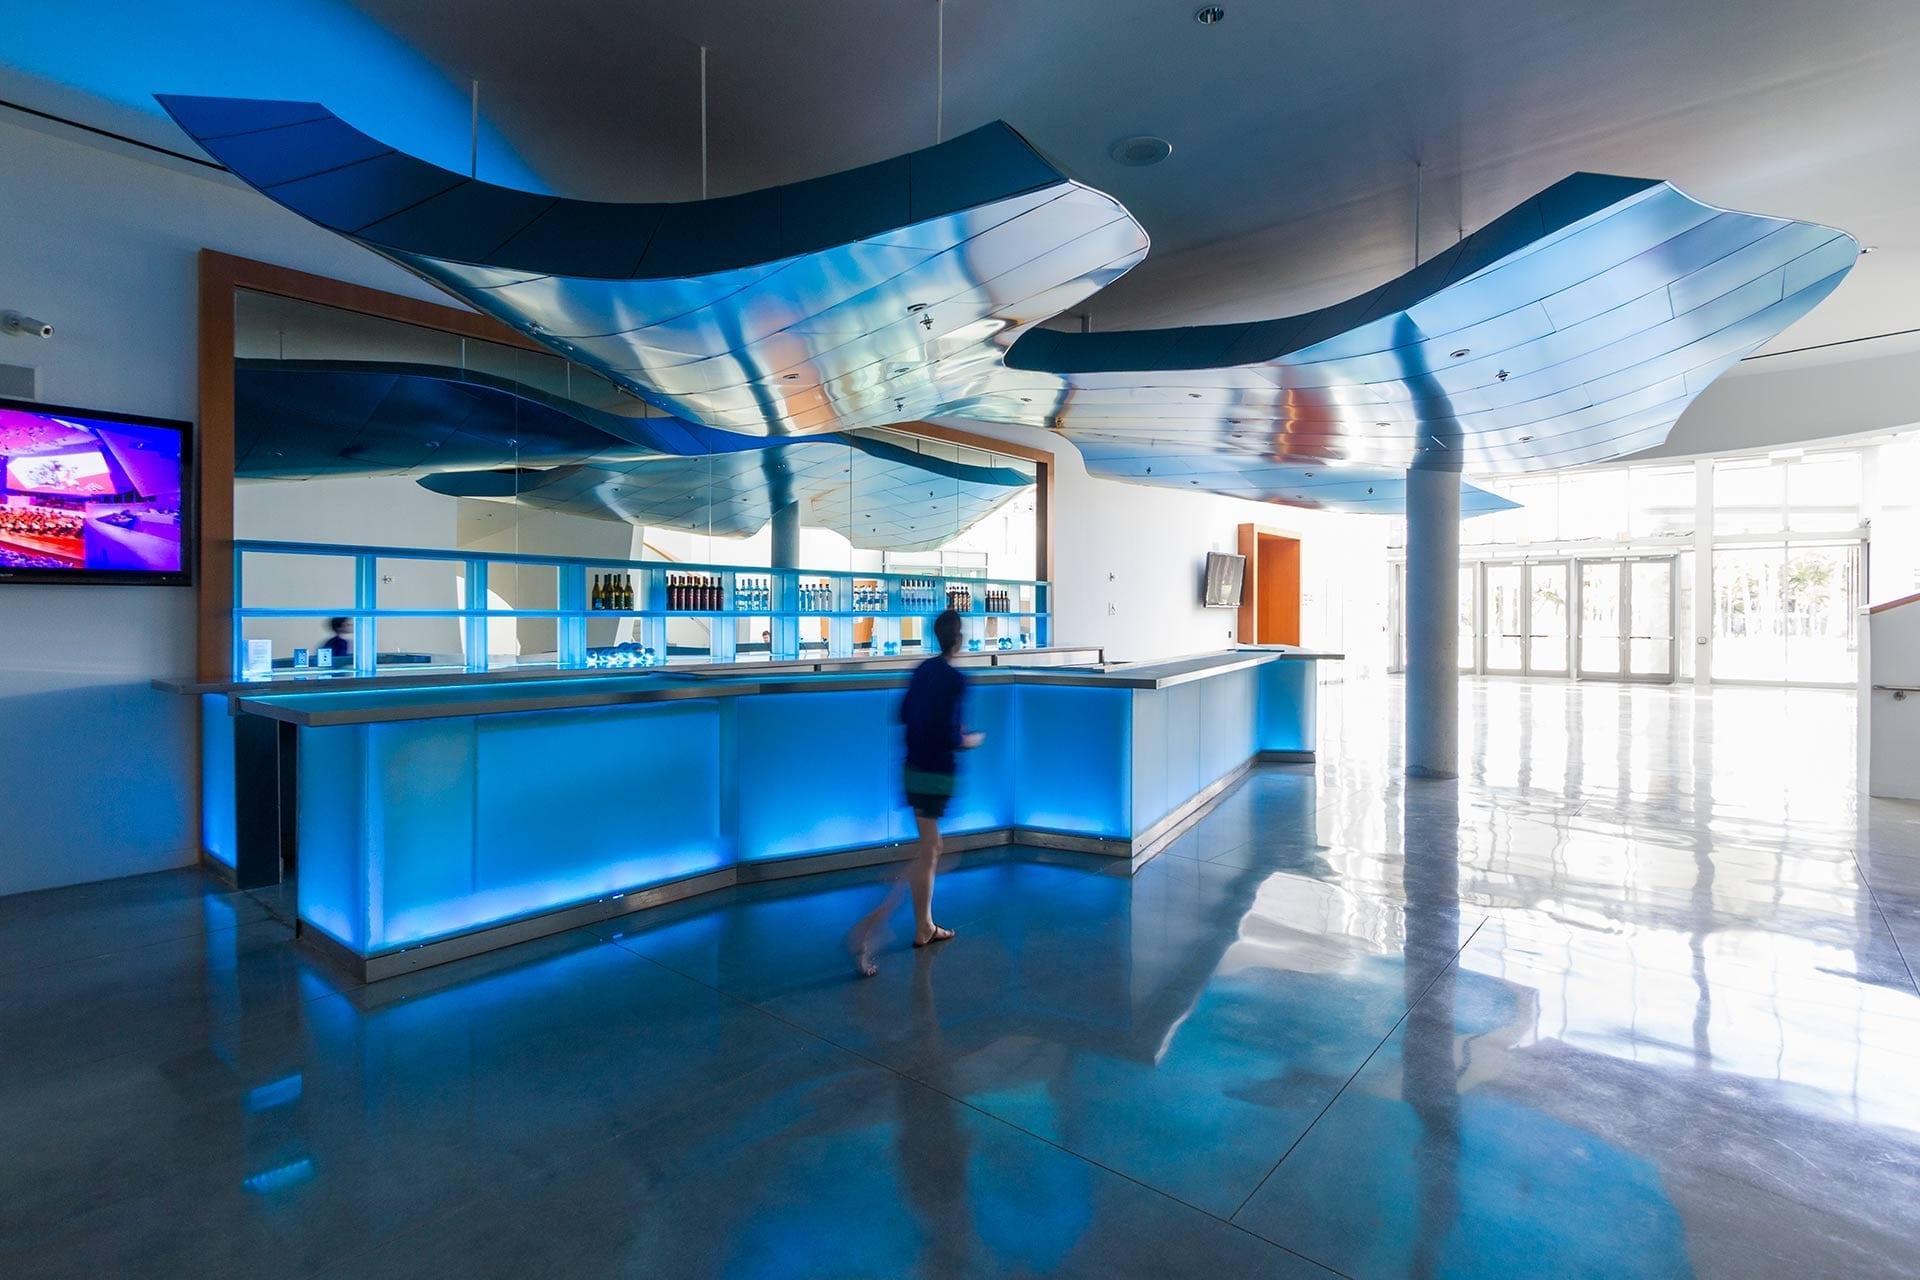 New World Symphony Bar in Miami, Florida.